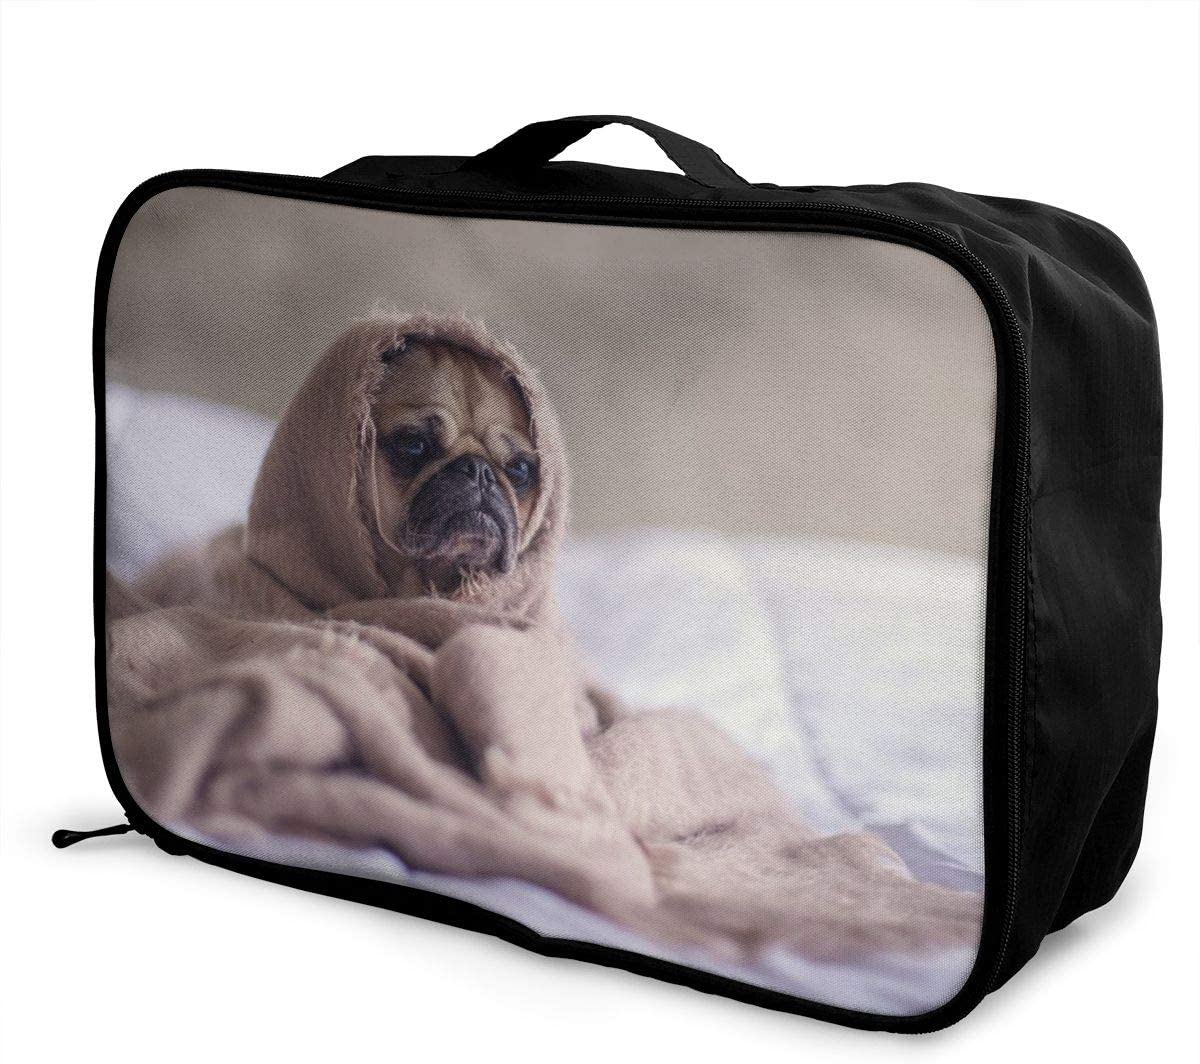 Yunshm Pug Dog Blanket Bed Face Animal Pet Funny Trolley Handbag Waterproof Unisex Large Capacity For Business Travel Storage